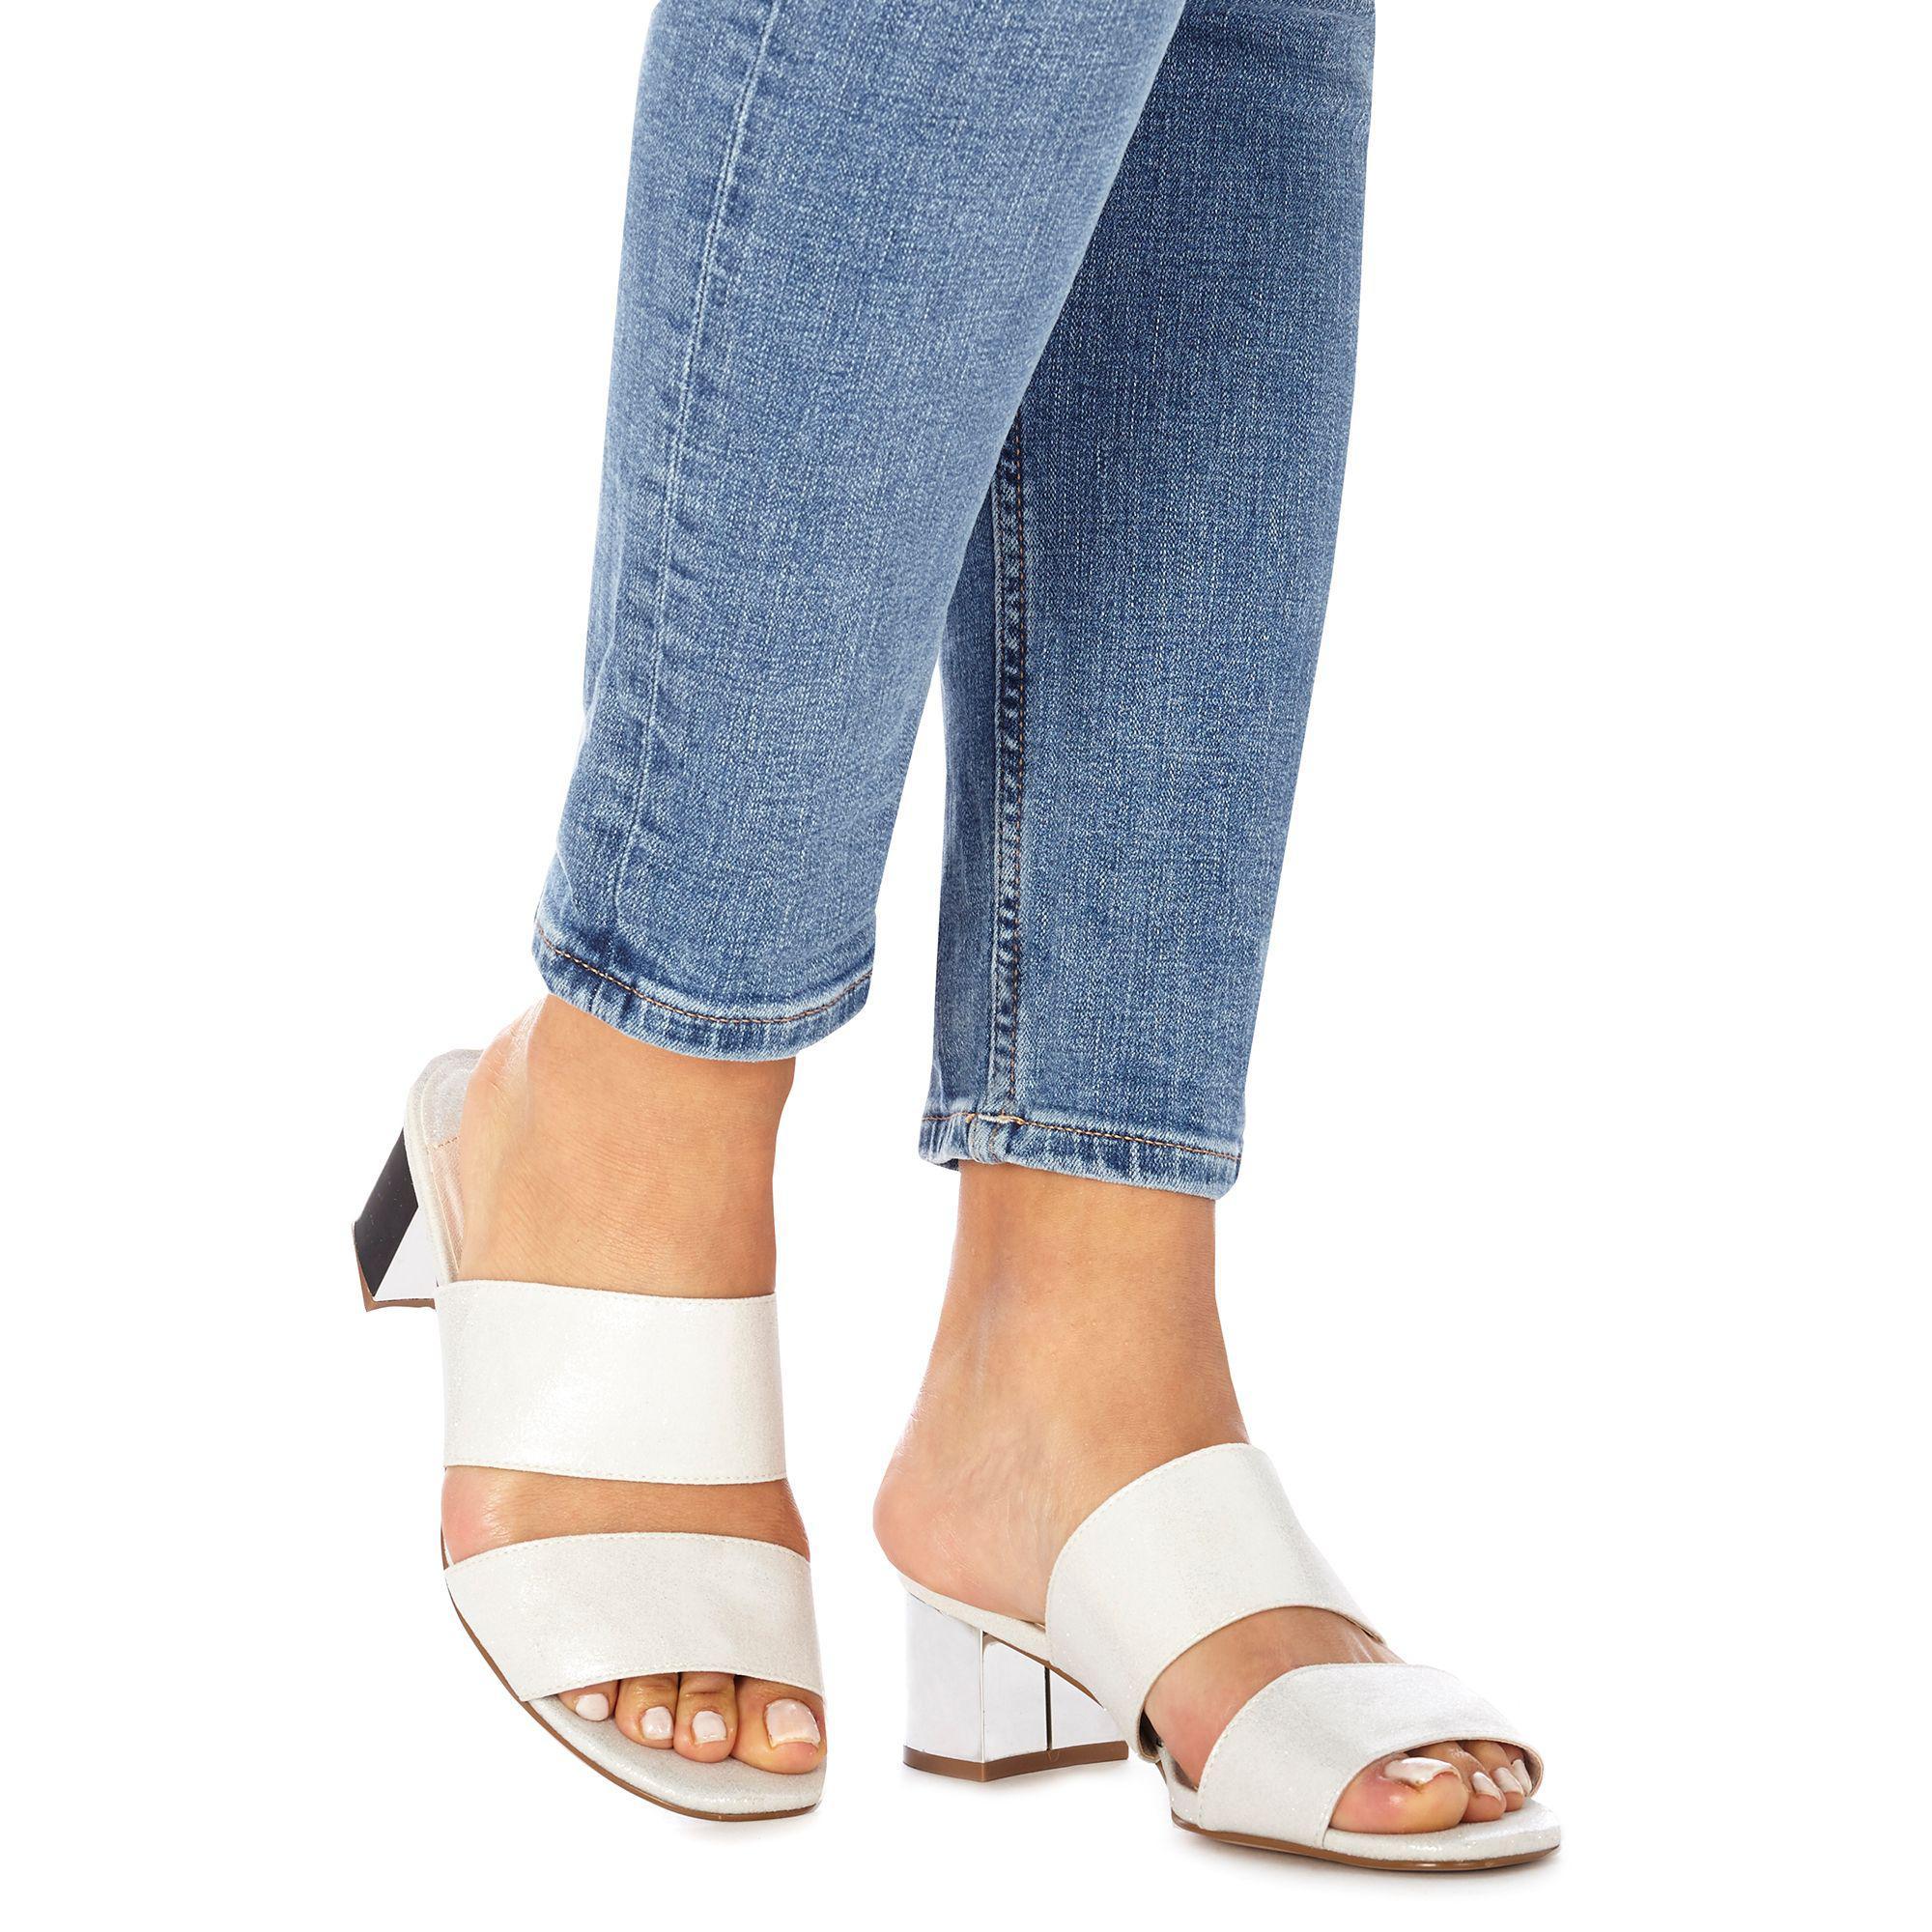 6436d2b0a4c Faith Silver  winona  Mid Block Heel Wide Fit Sandals in Metallic - Lyst